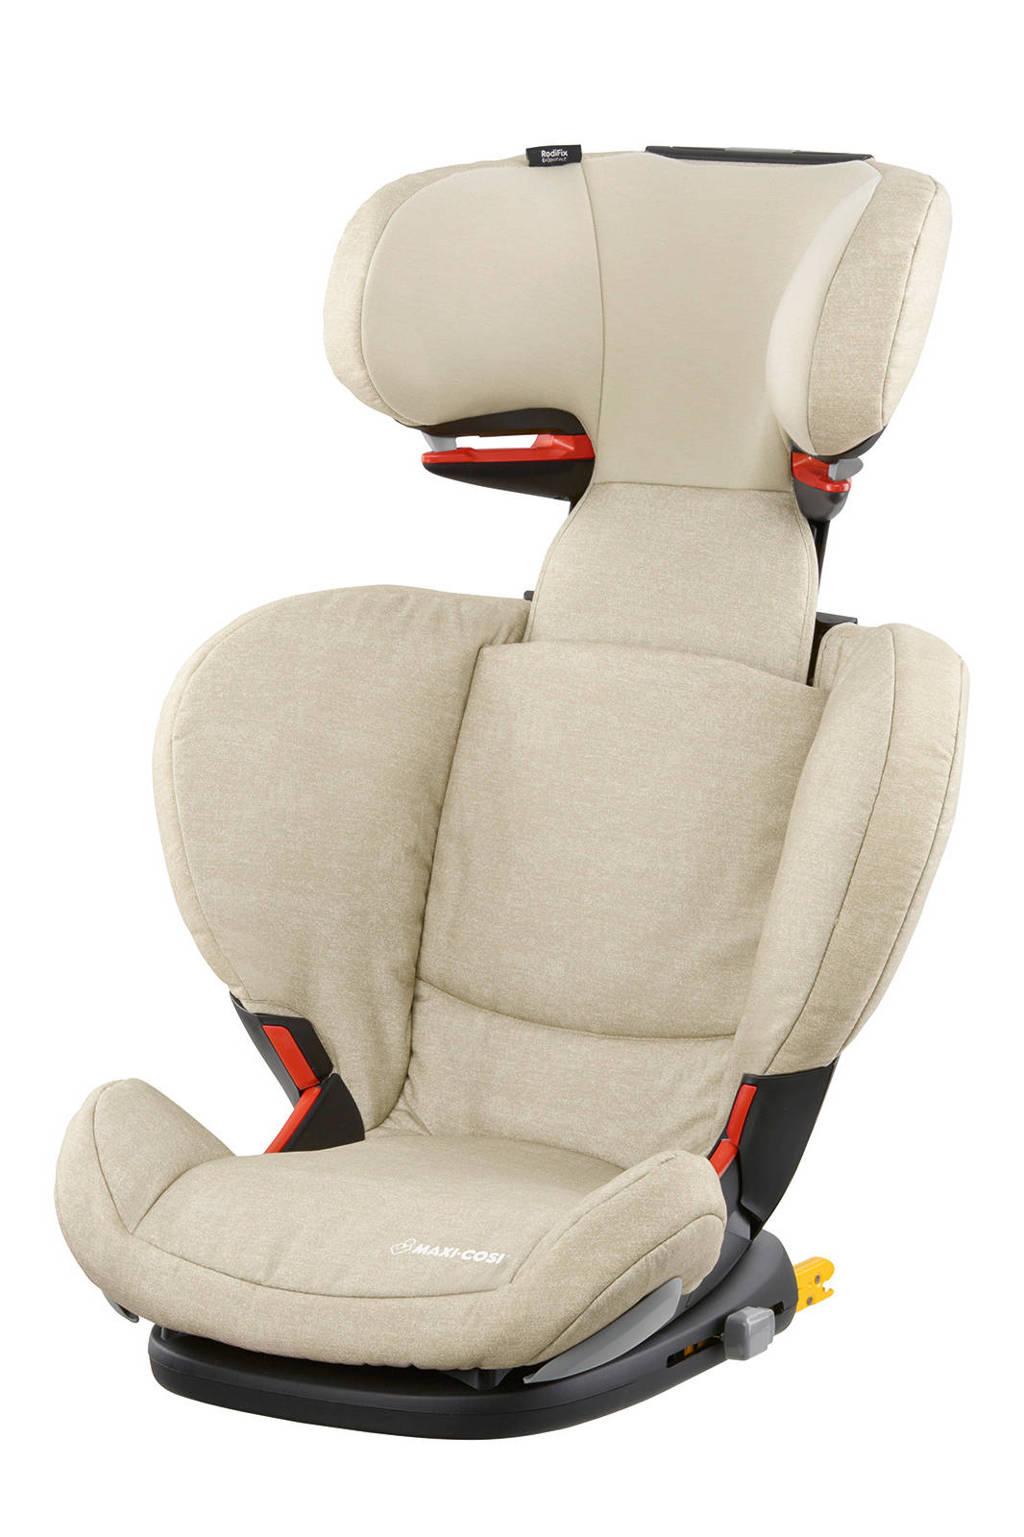 Maxi-Cosi Rodifix Air Protect autostoel, Nomad sand